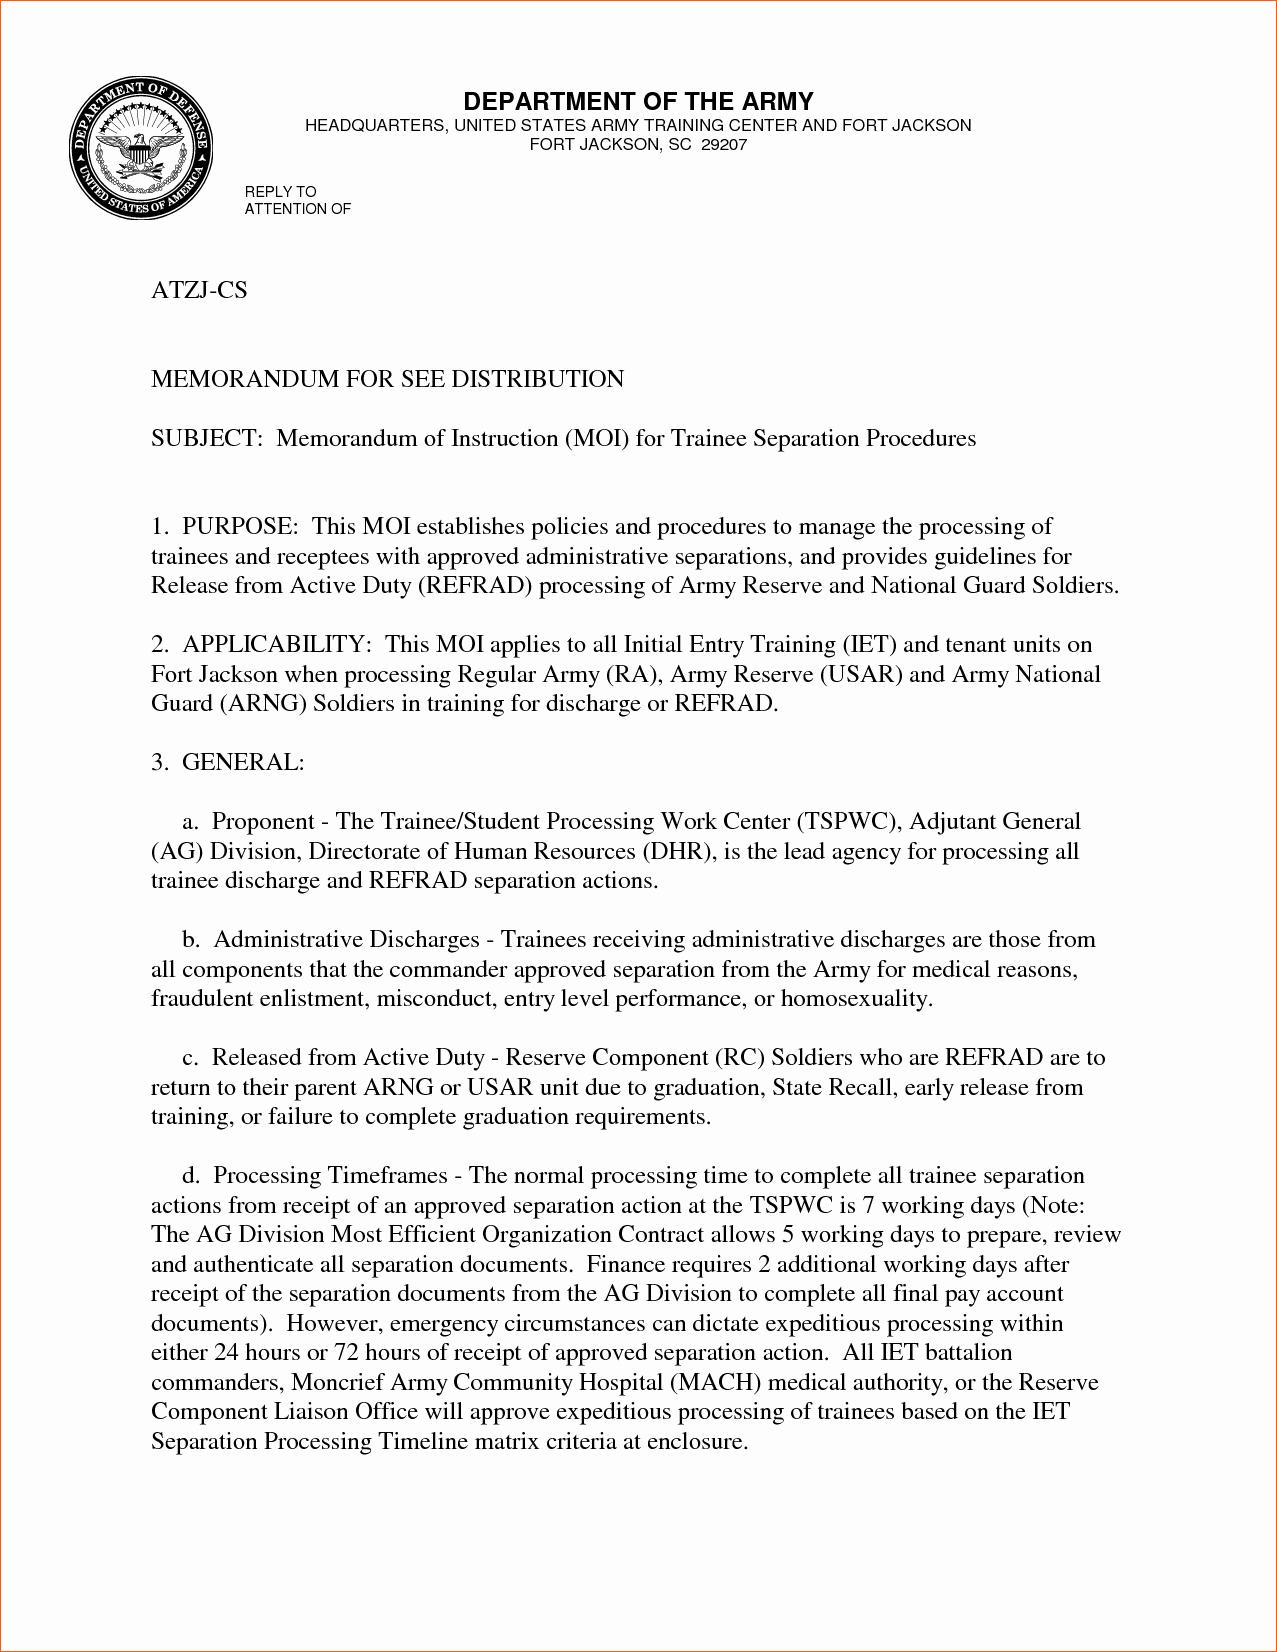 Army Memorandum for Record Template Fresh 19 Of Memorandum for Record Template Pdf with A